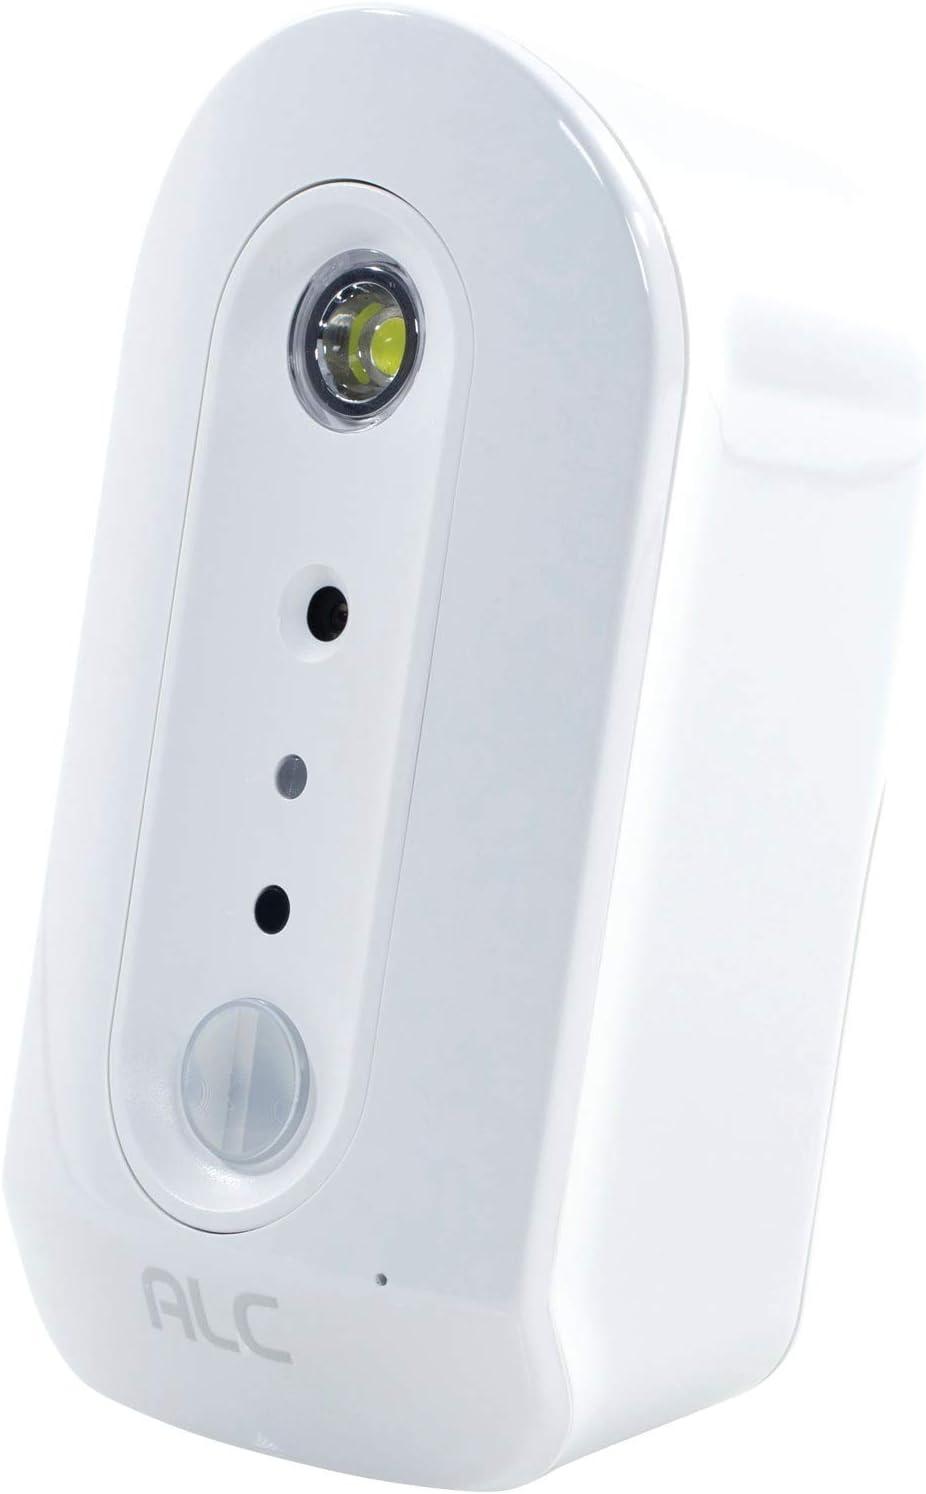 SensorCam AWFB15 Battery-Powered Wi-Fi® Indoor Camera